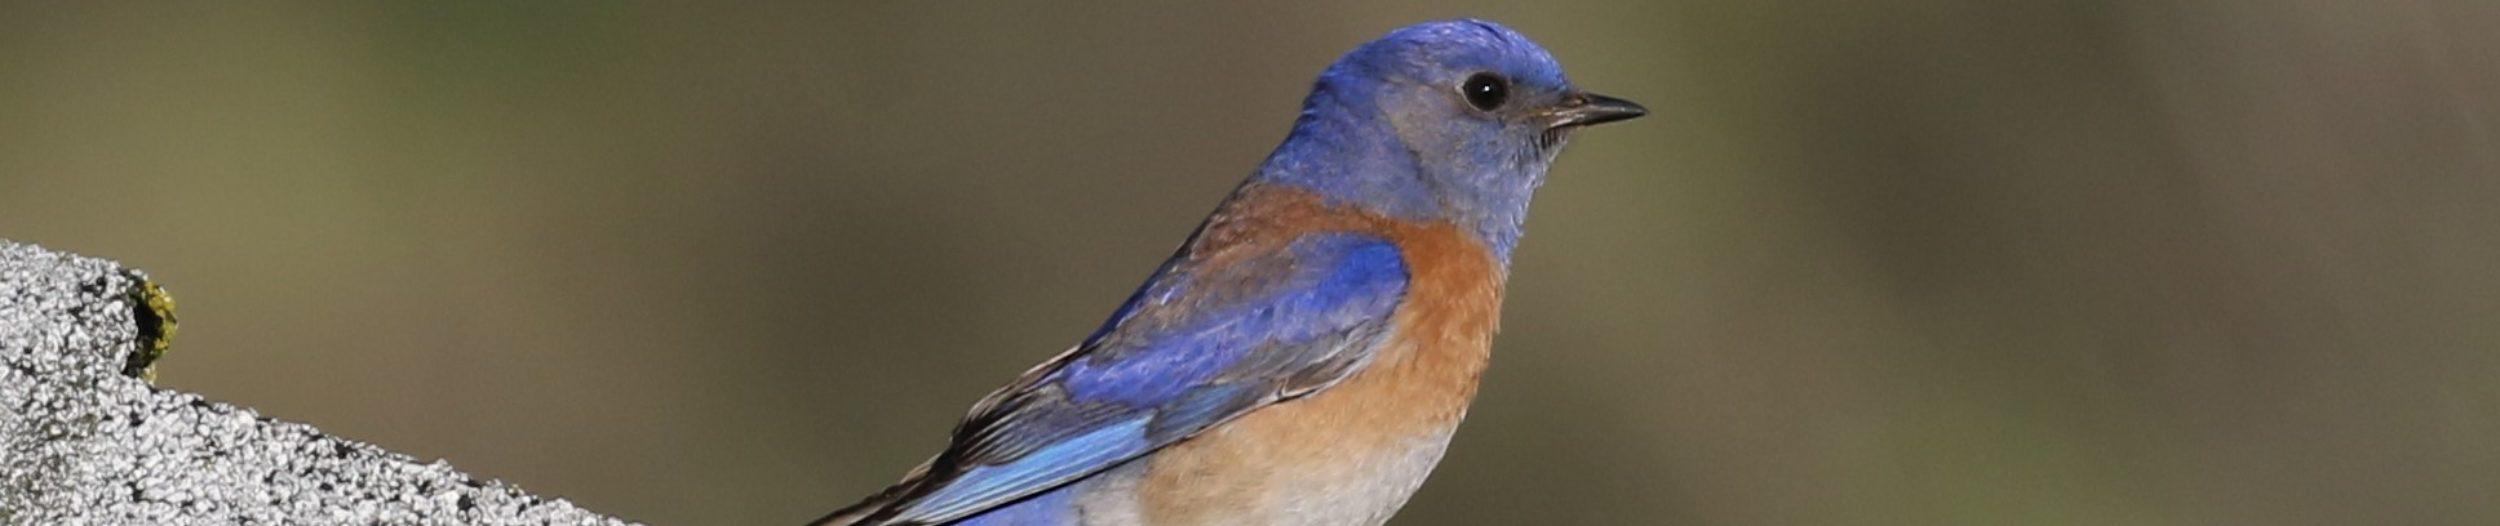 Conejo Valley Audubon Society